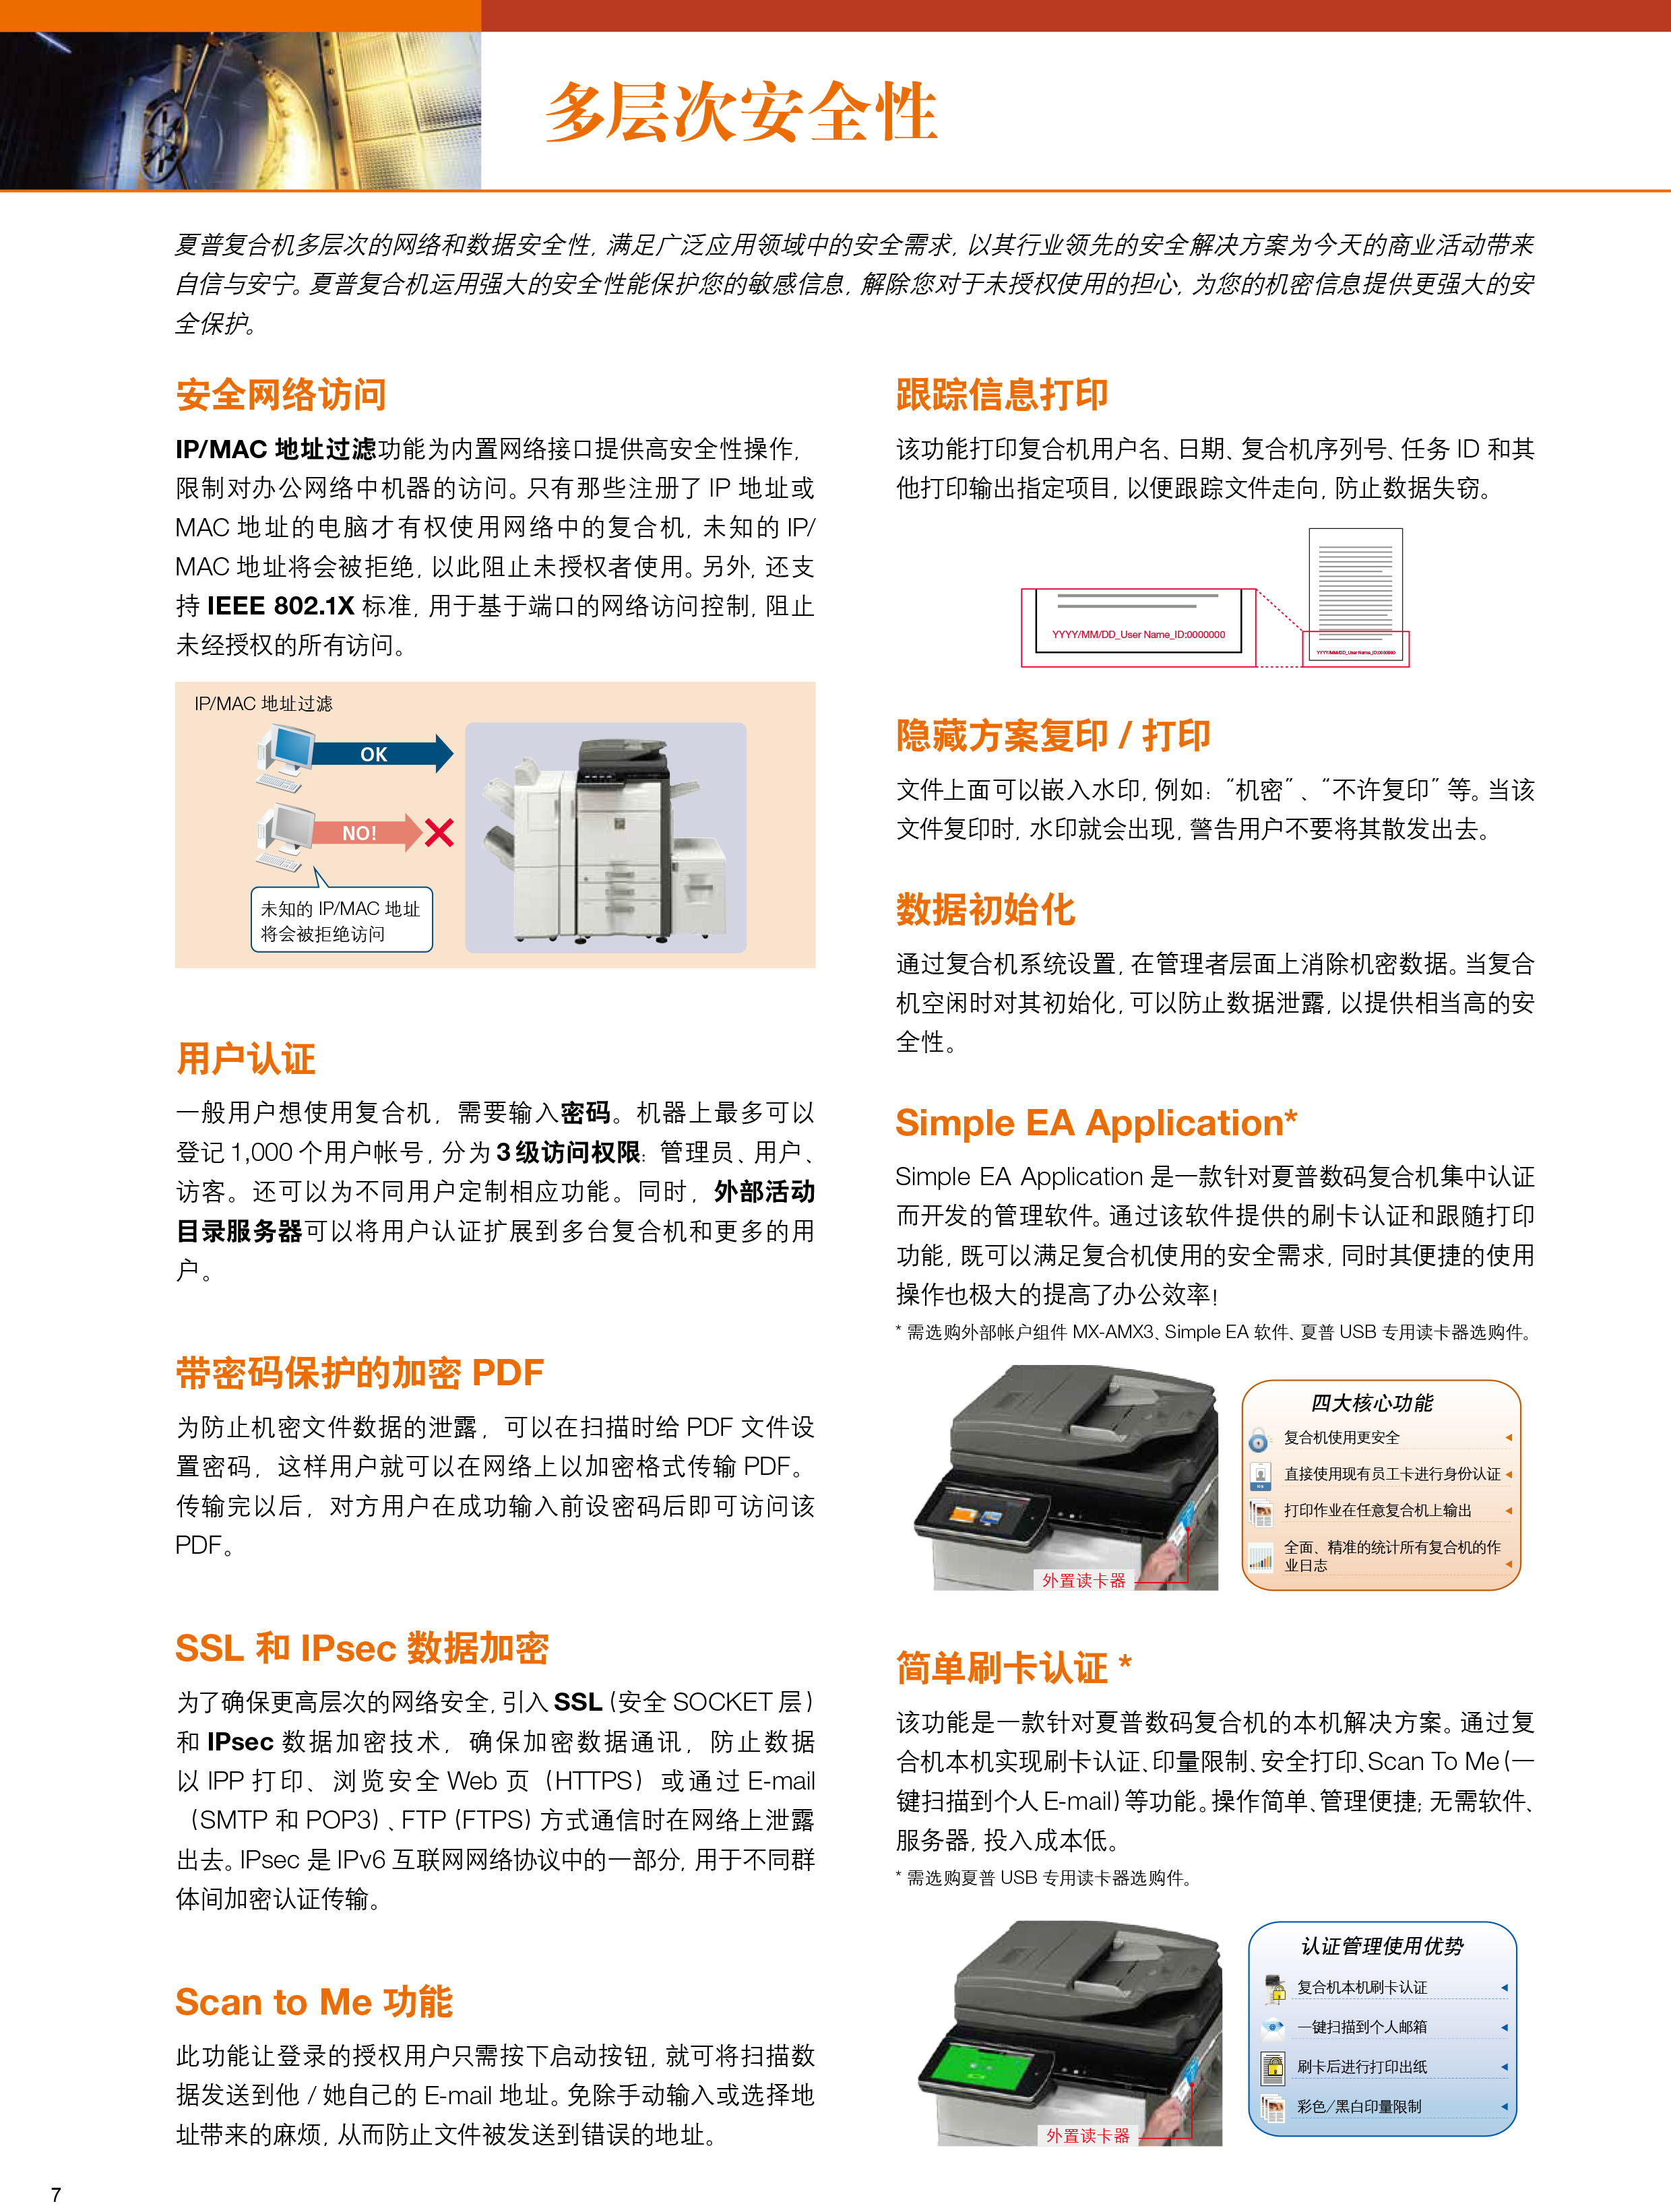 MX-5148NC_4148NC彩頁-8.jpg